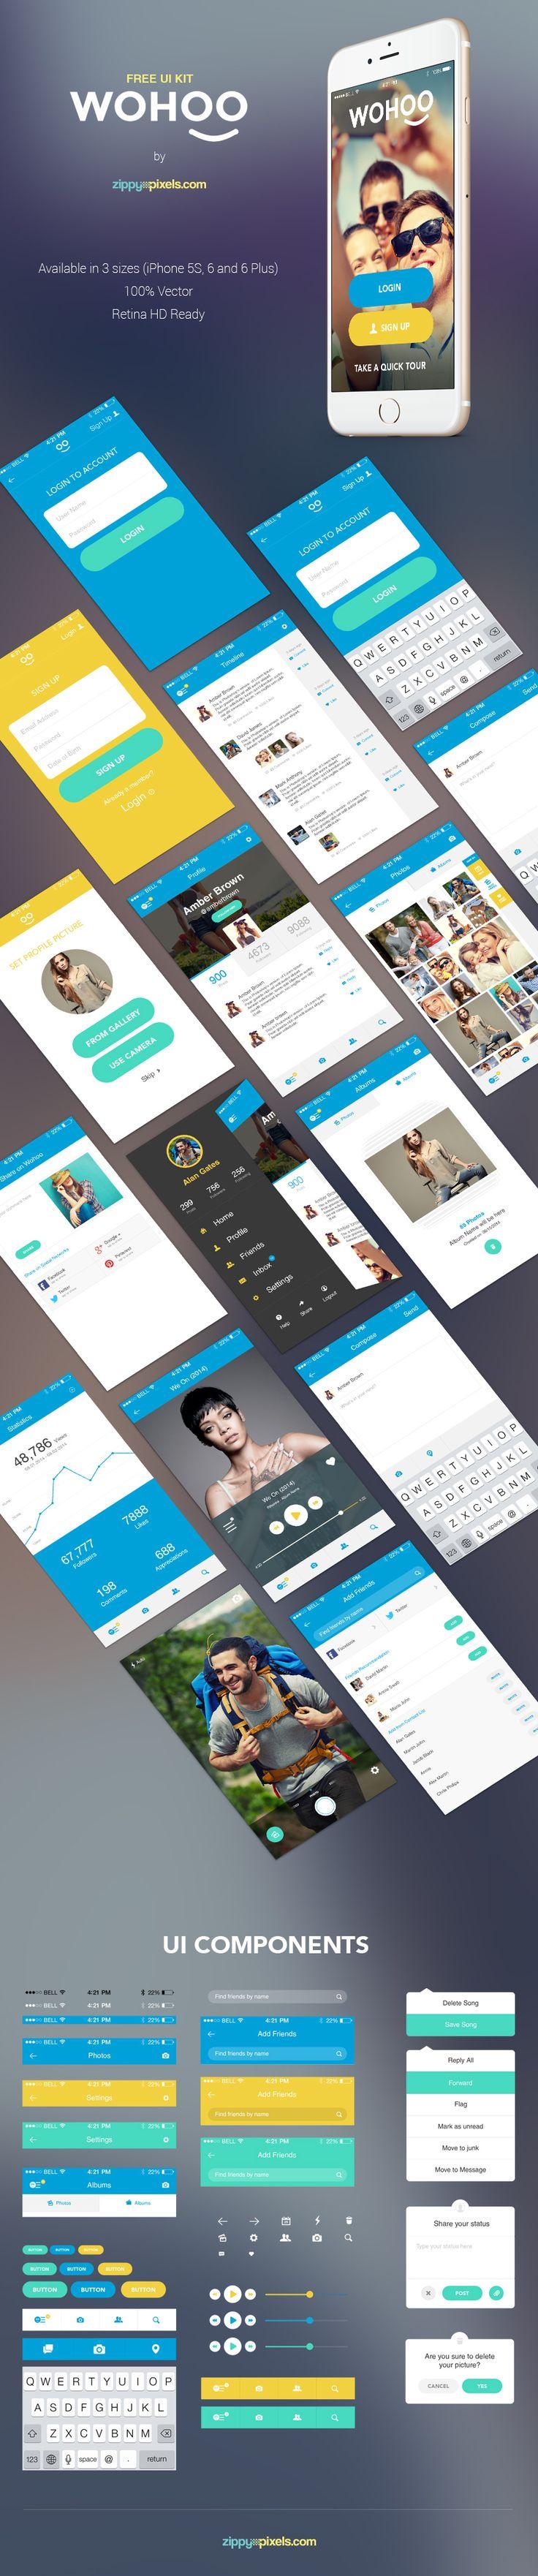 WOHOO – FREE Retina Ready Mobile UI KIT